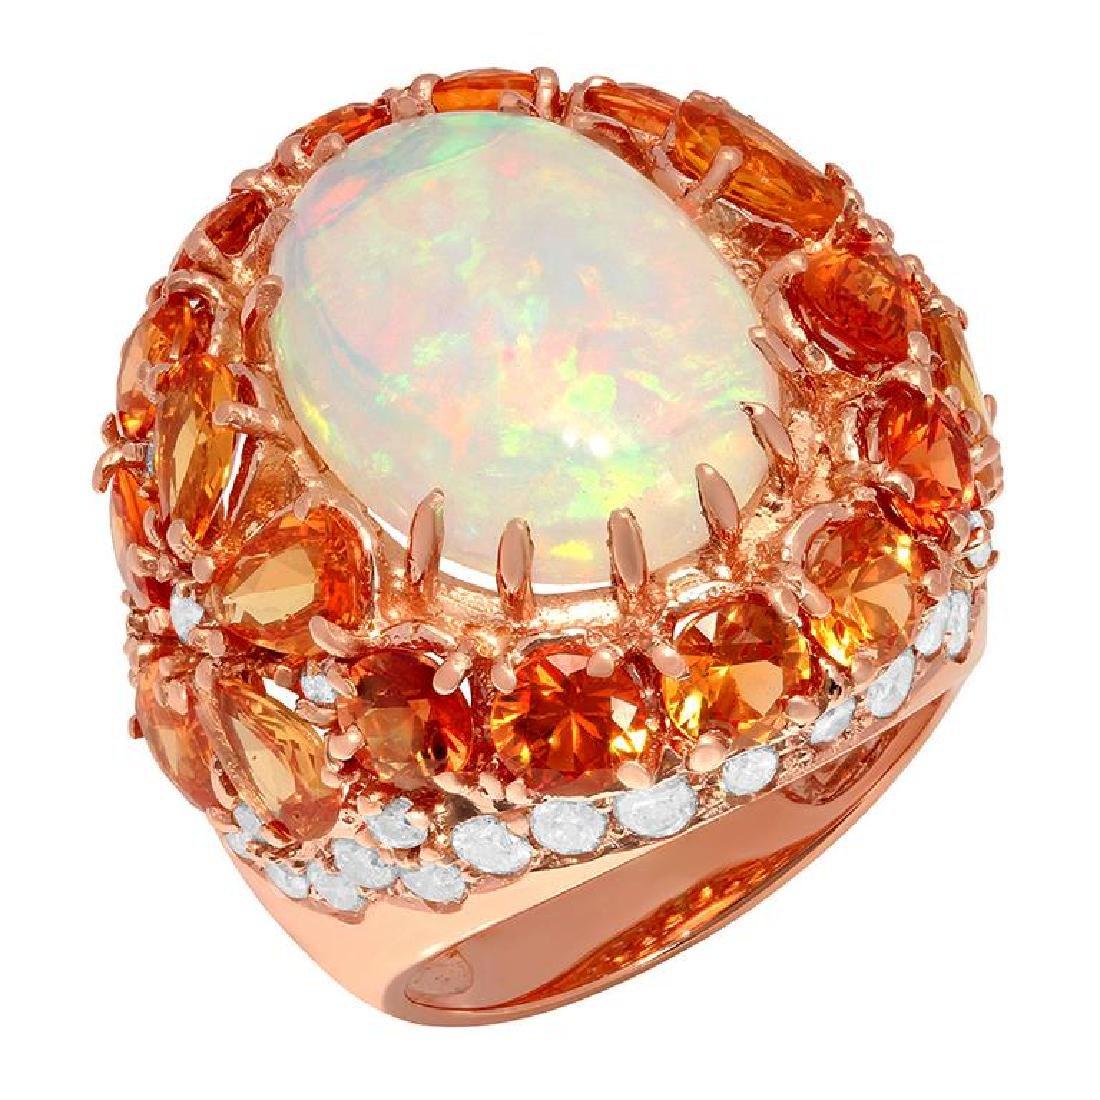 14k Rose Gold 7.02ct White Opal 9.56ct Orange Sapphire